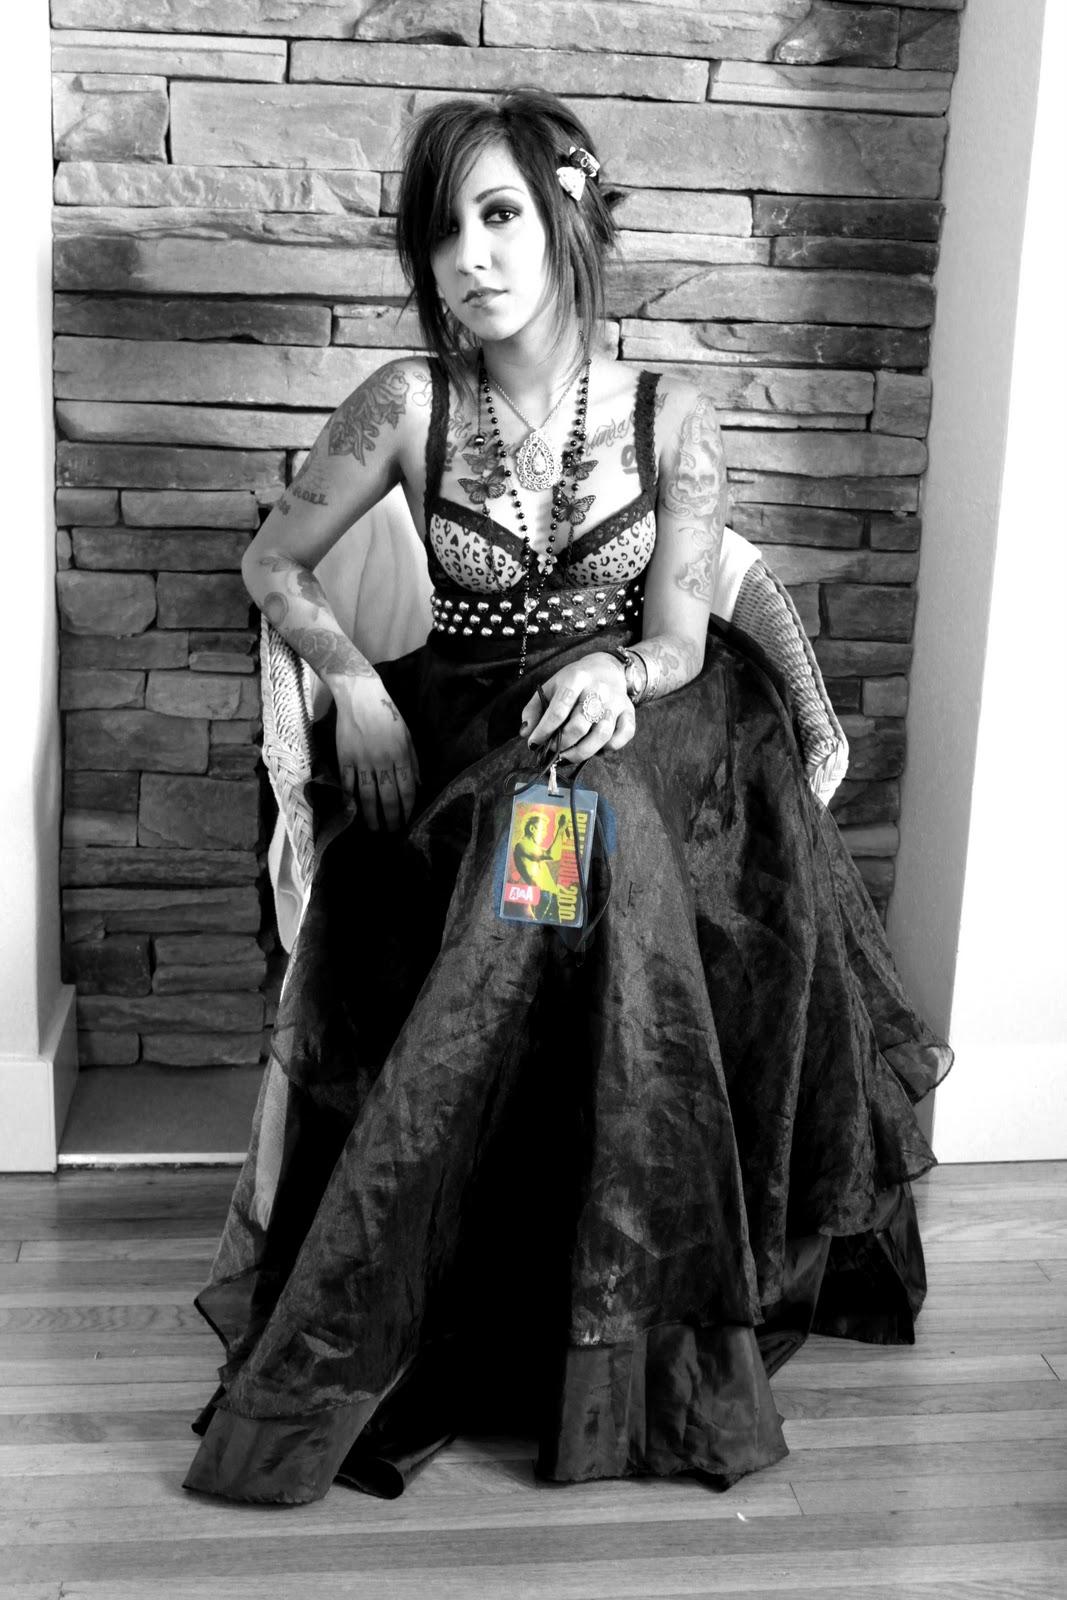 Lade Strane doctor lady strange cosplay project nerd  : mePORTRAIT from www.blackhairstylecuts.com size 1067 x 1600 jpeg 263kB